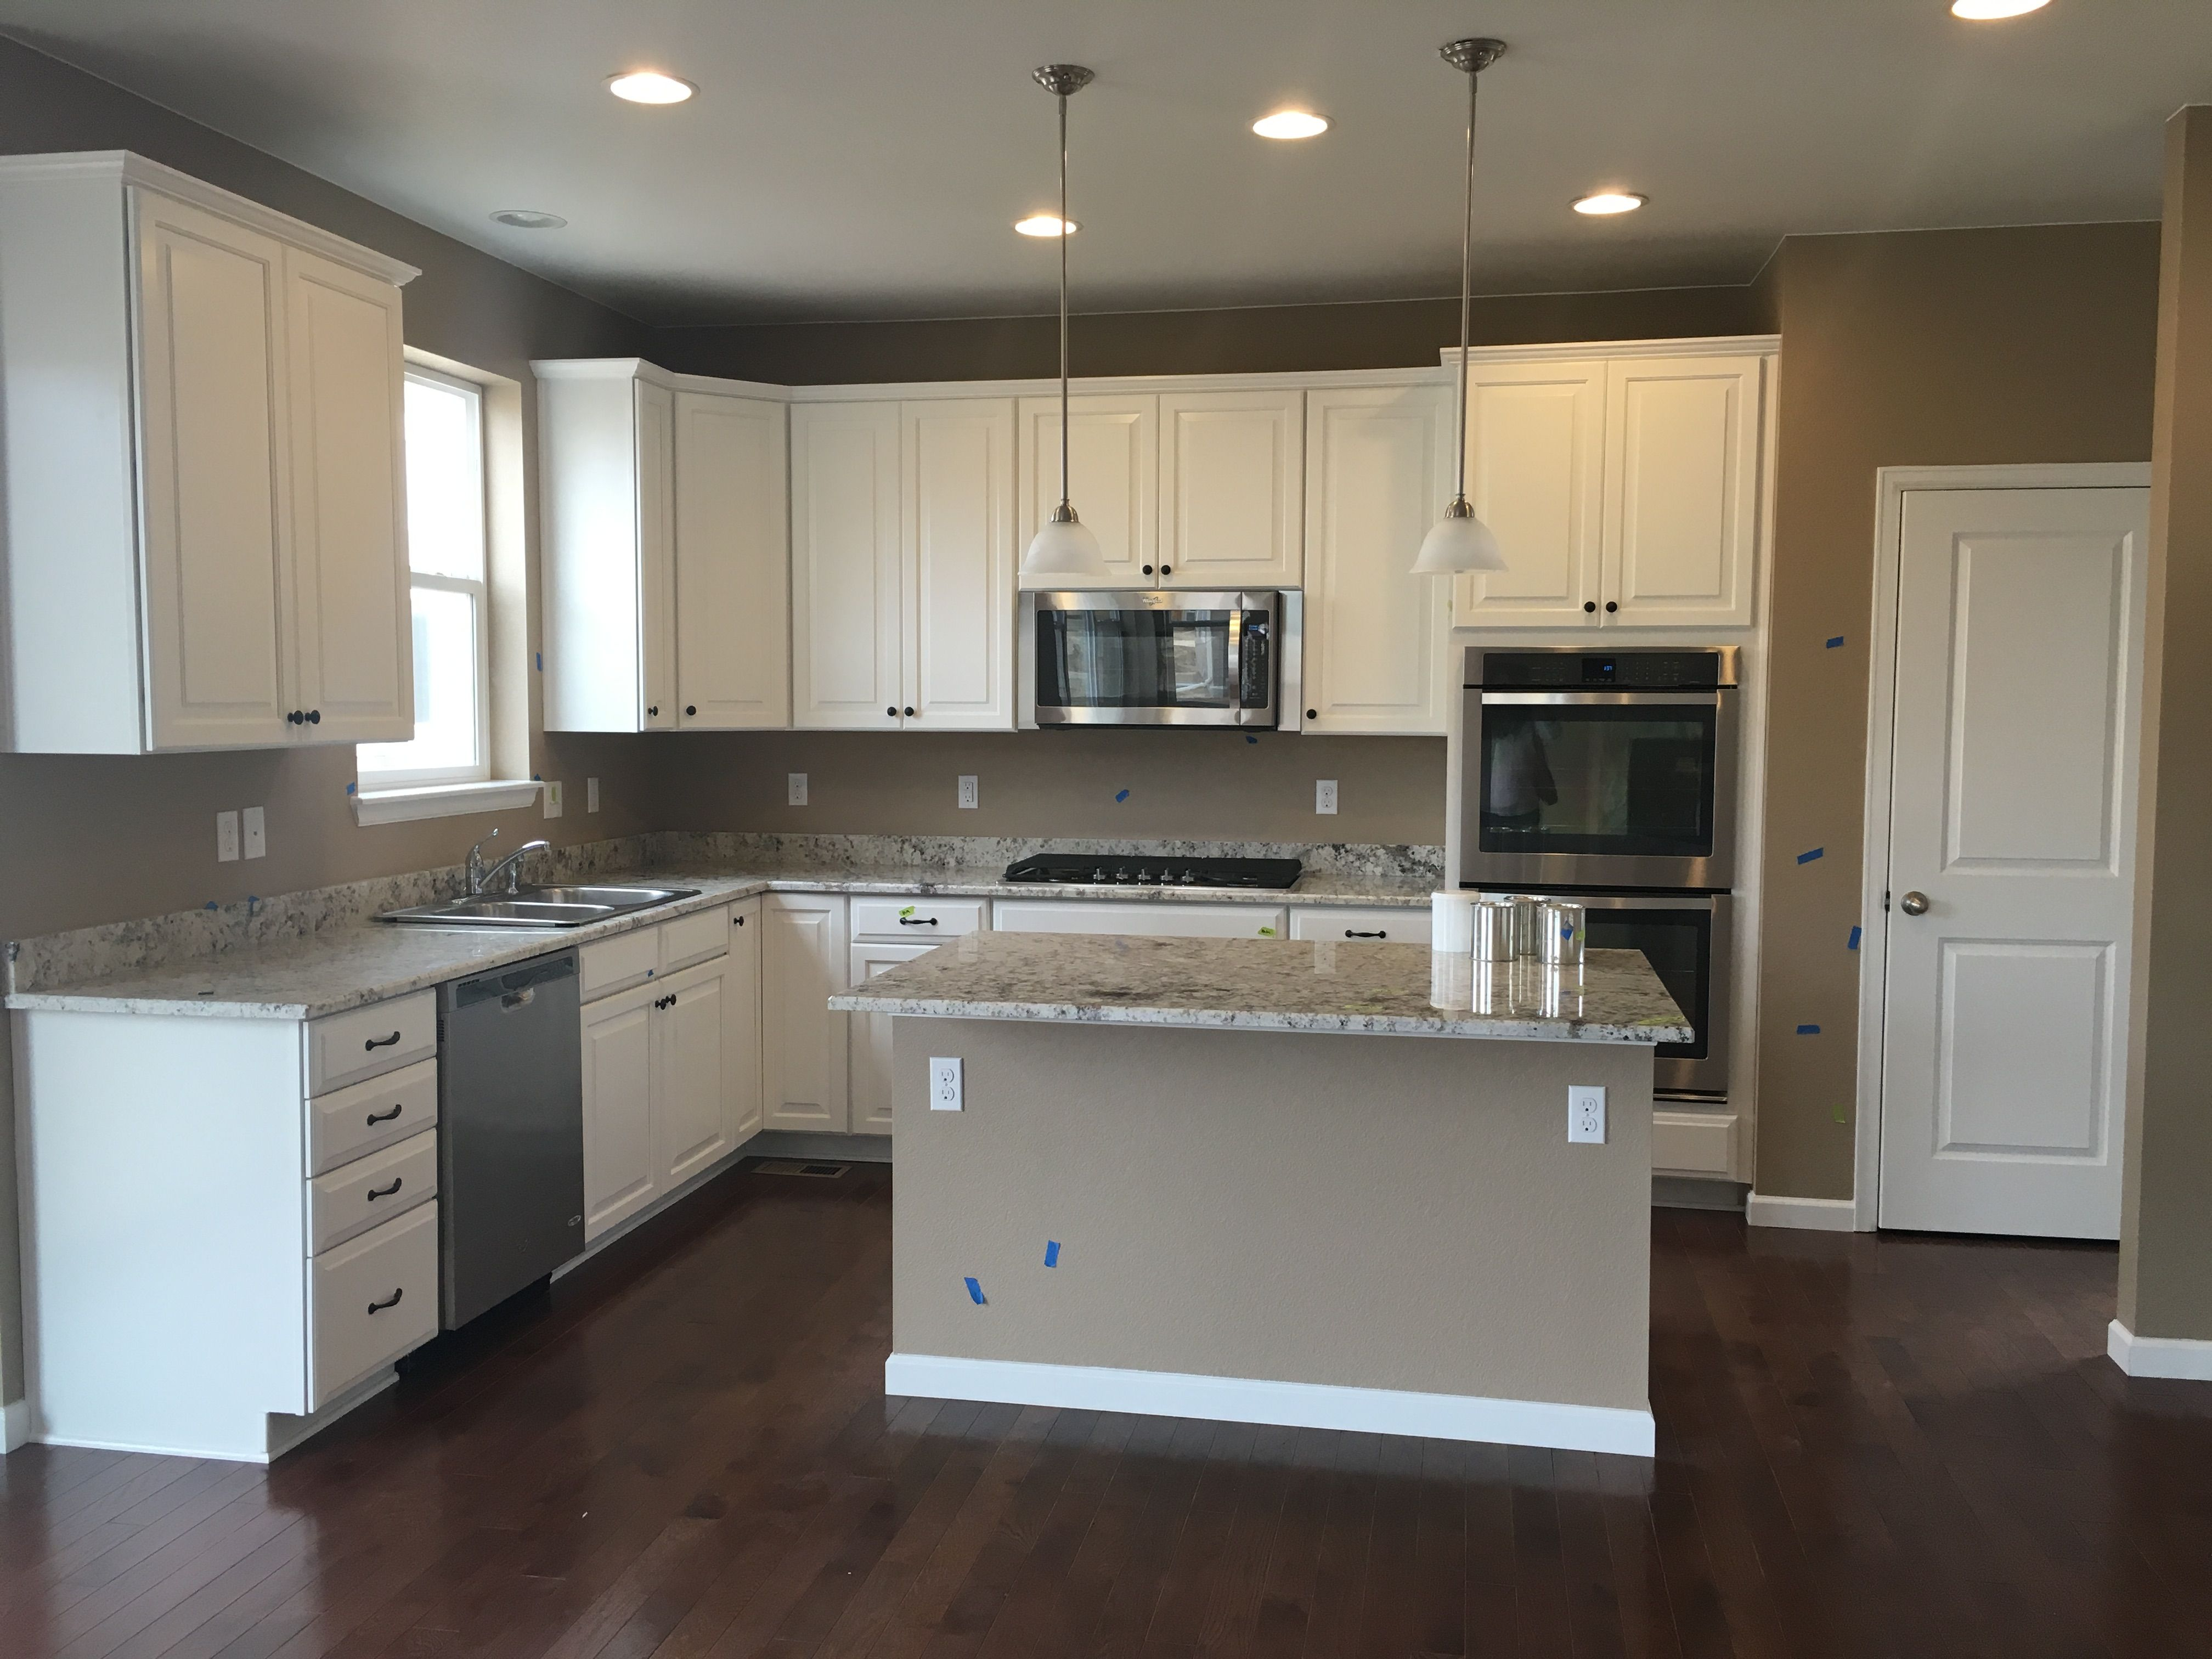 Timberlake Rushmore Linen Cabinets White Galaxy Granite Ctop Solid Hickory Hardwood Fl Black Appliances Kitchen White Kitchen Black Appliances Black Kitchens